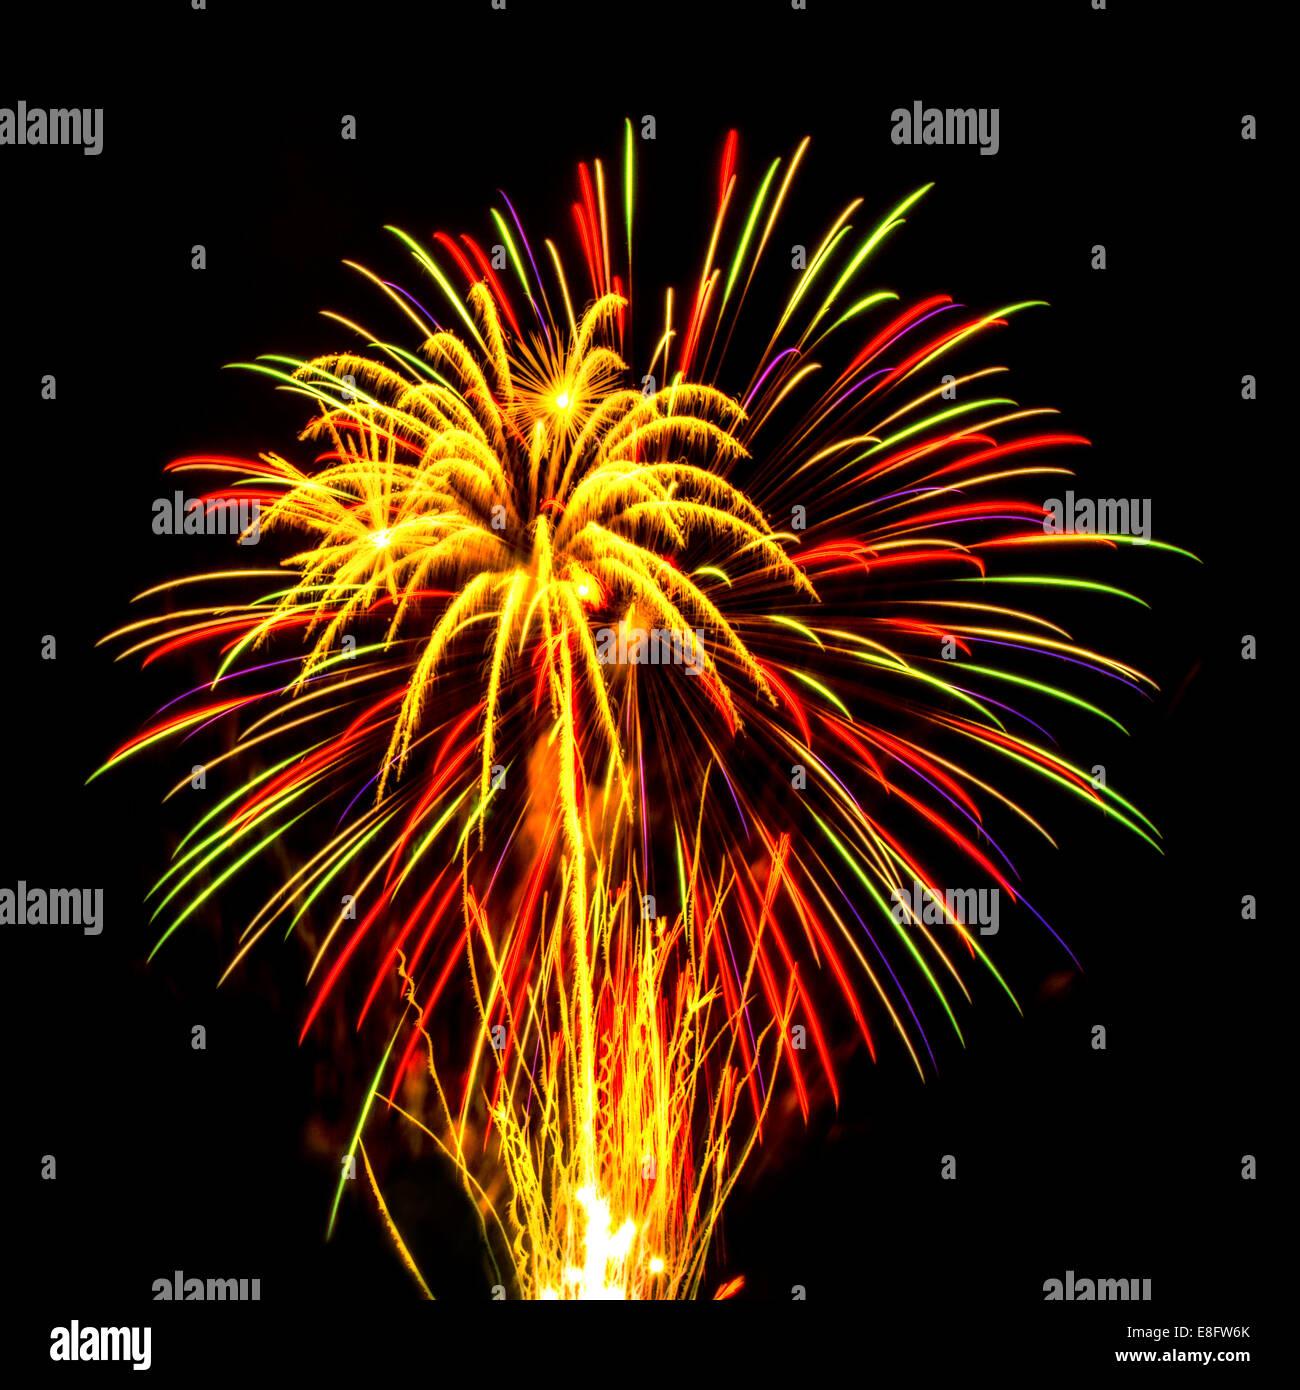 Firework display - Stock Image